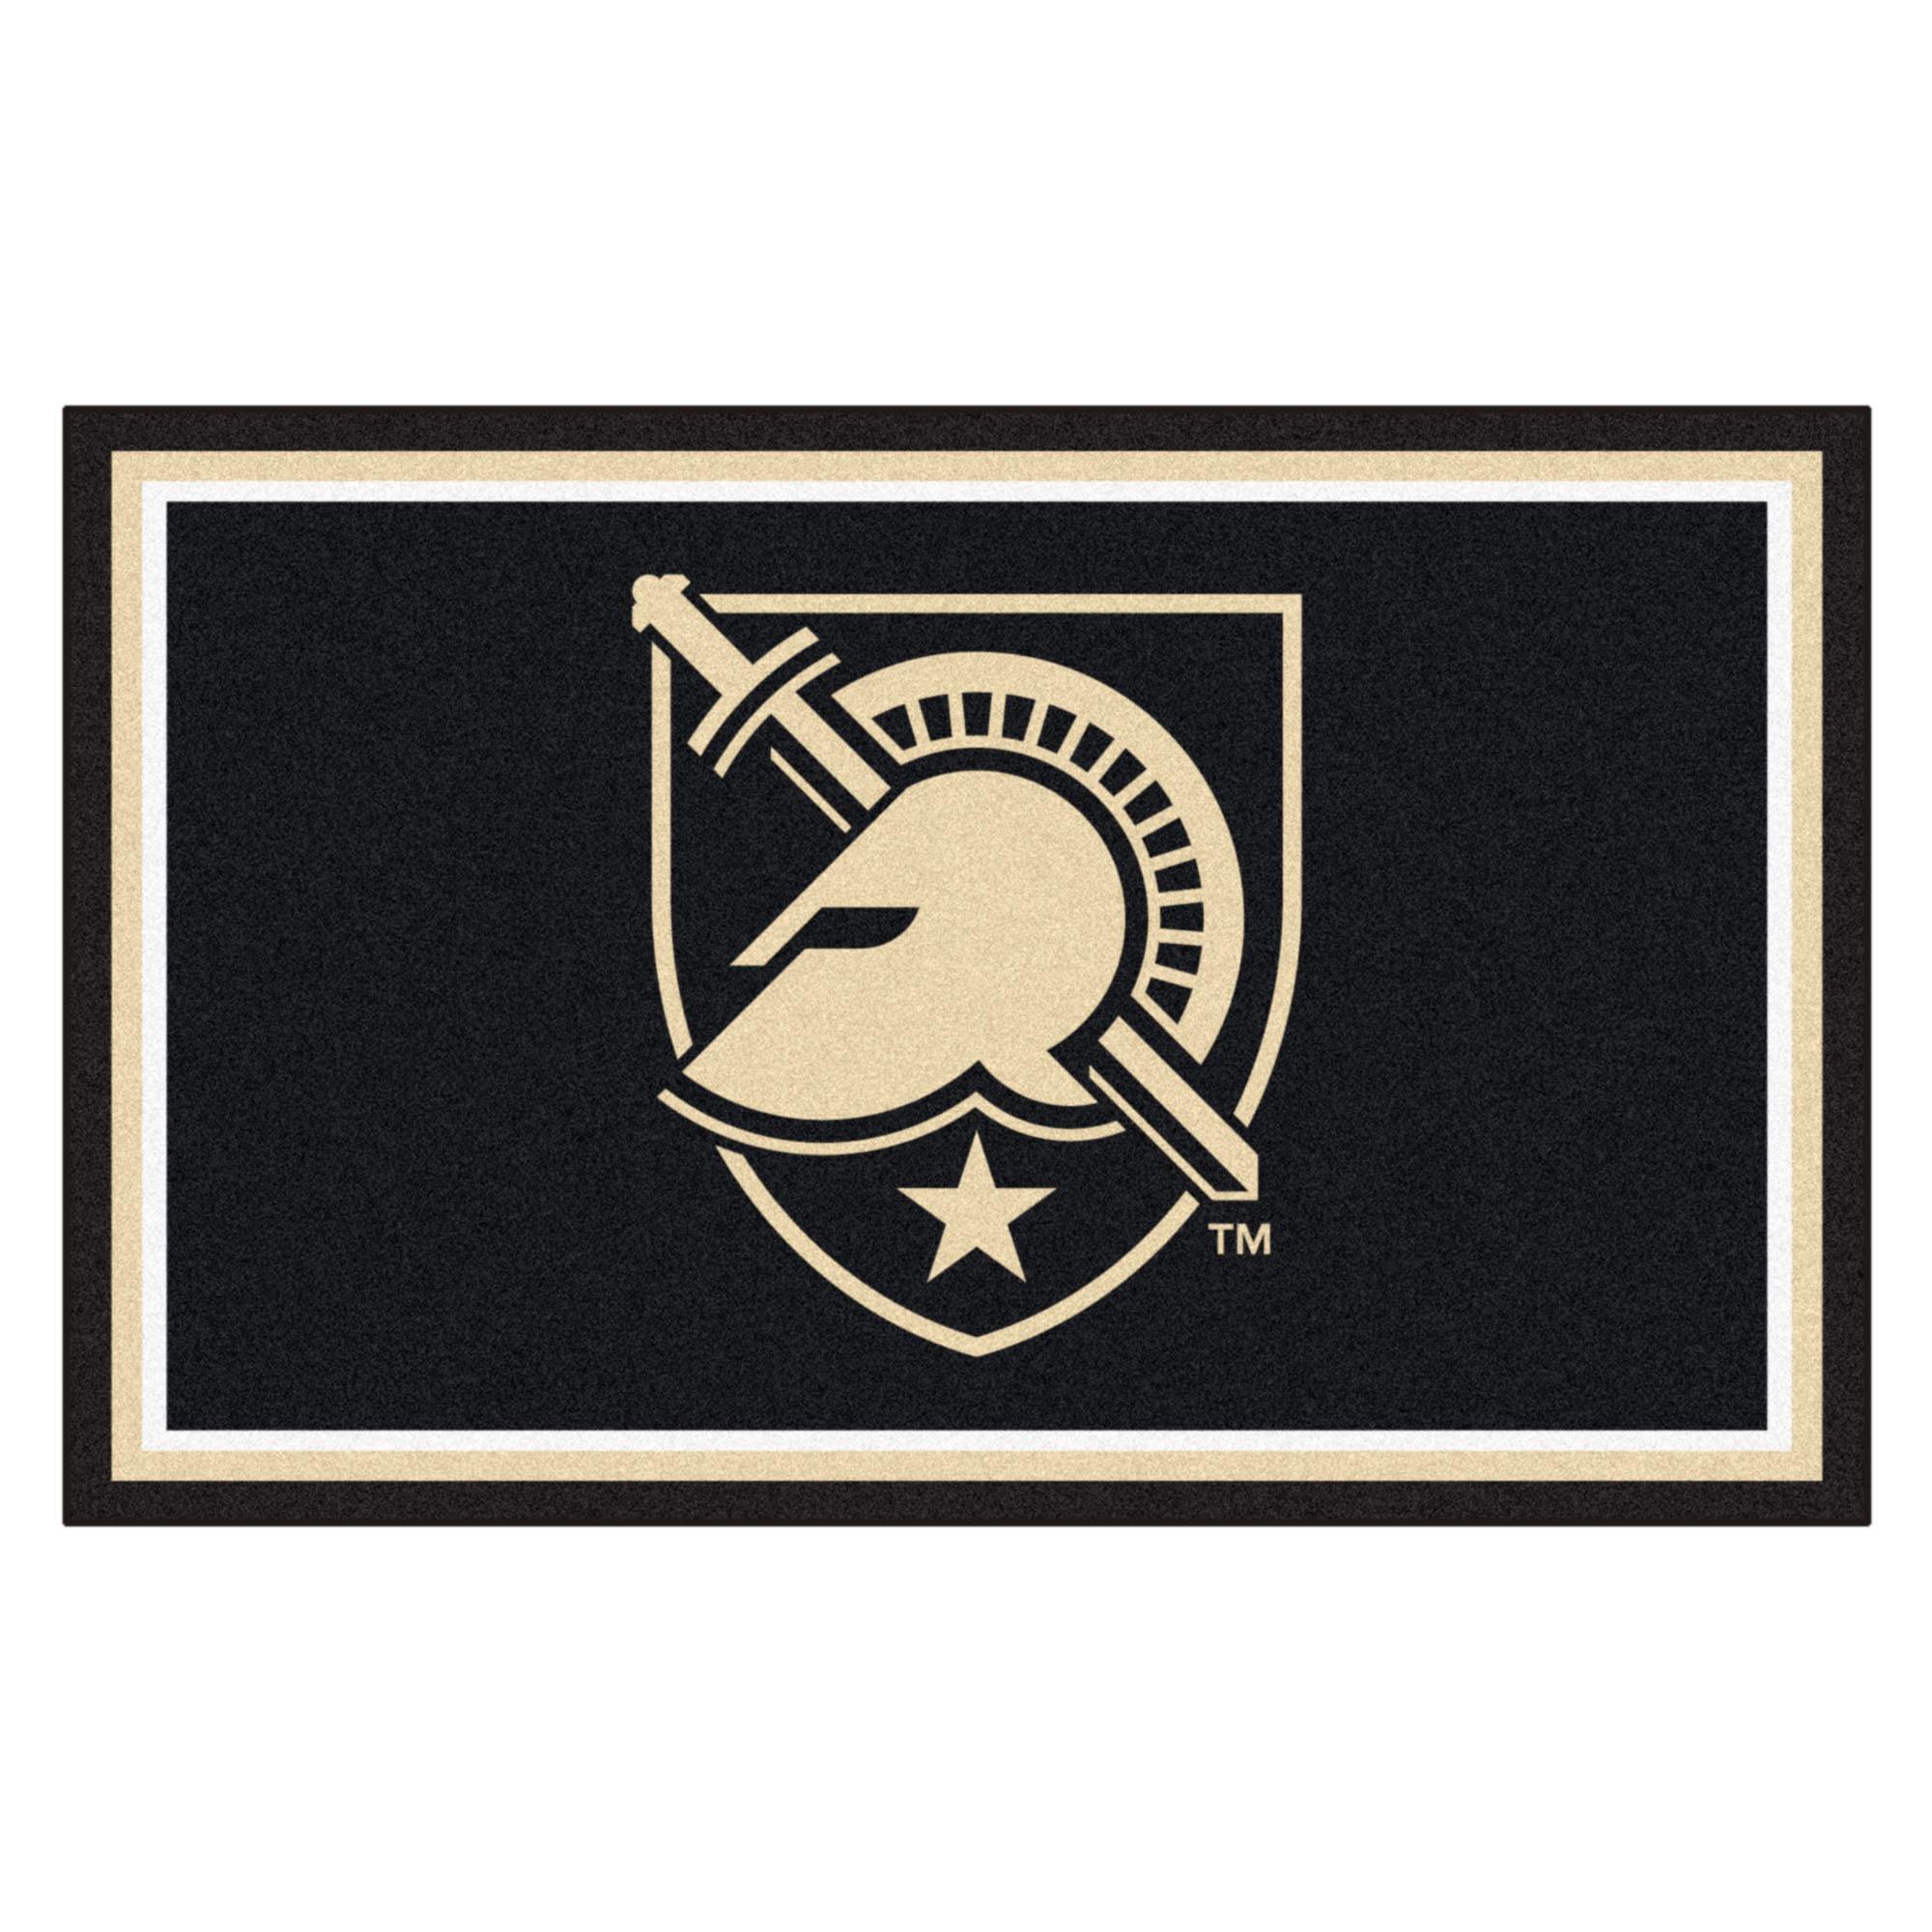 U.S. Military Academy 4 x 6 Foot Plush Non-Skid Area Rug